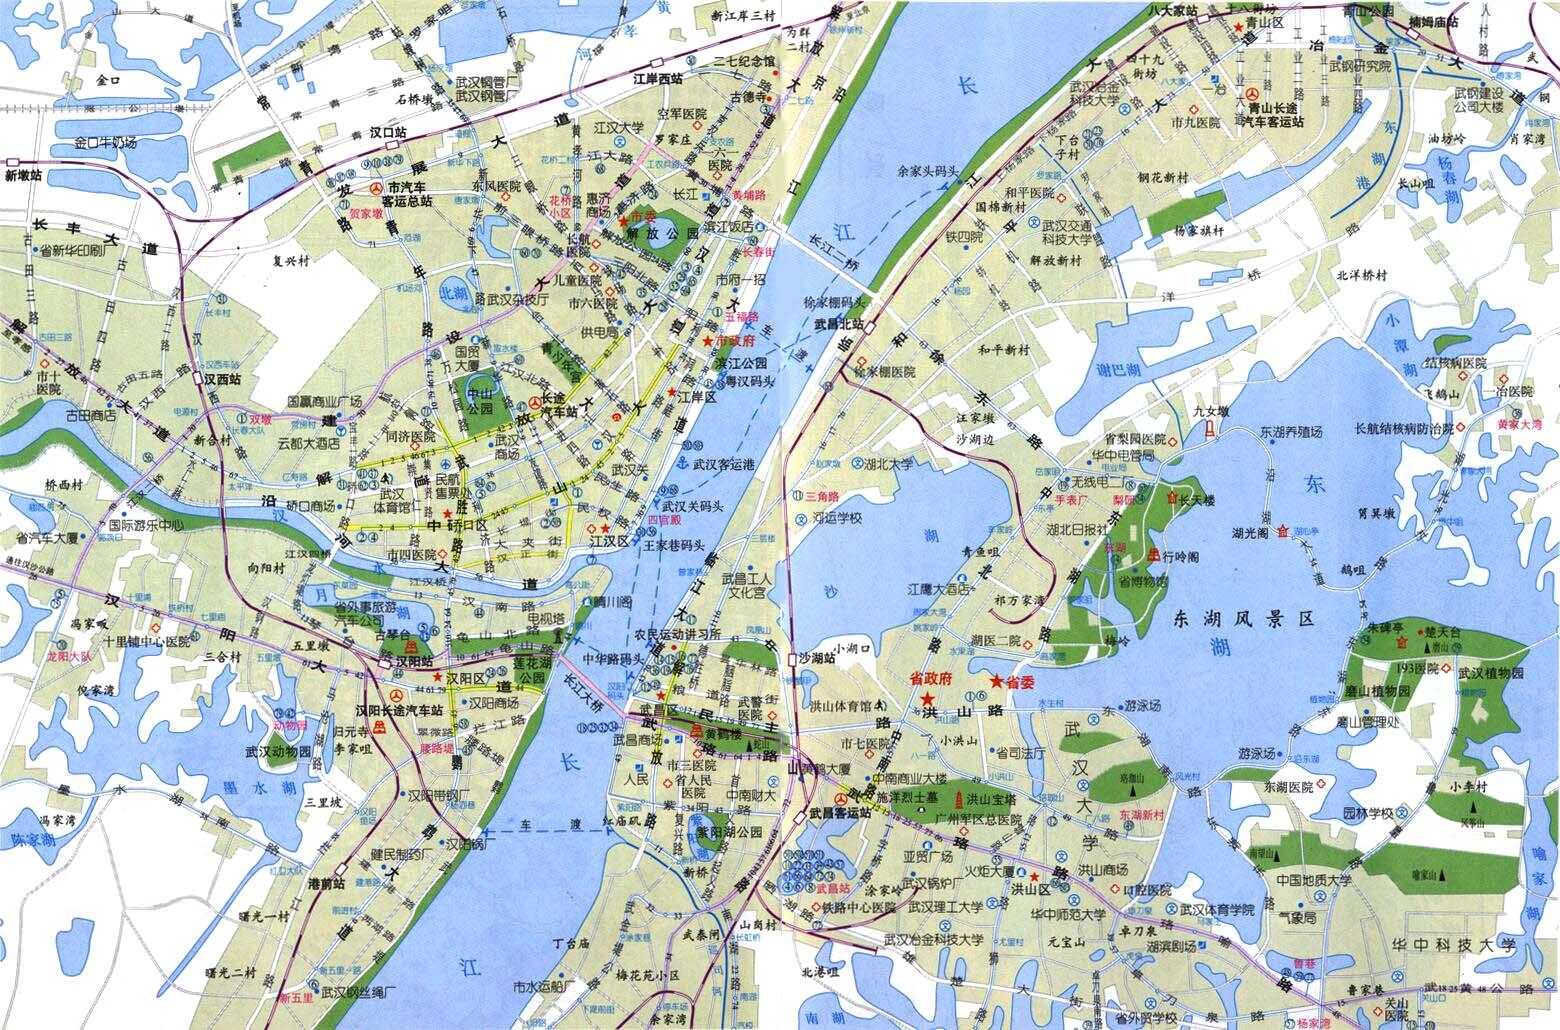 File Ourika berbere village furthermore Jiangsu additionally Sanya Eyot In Hainan also Haikou Map China besides China City Guide. on hainan map location